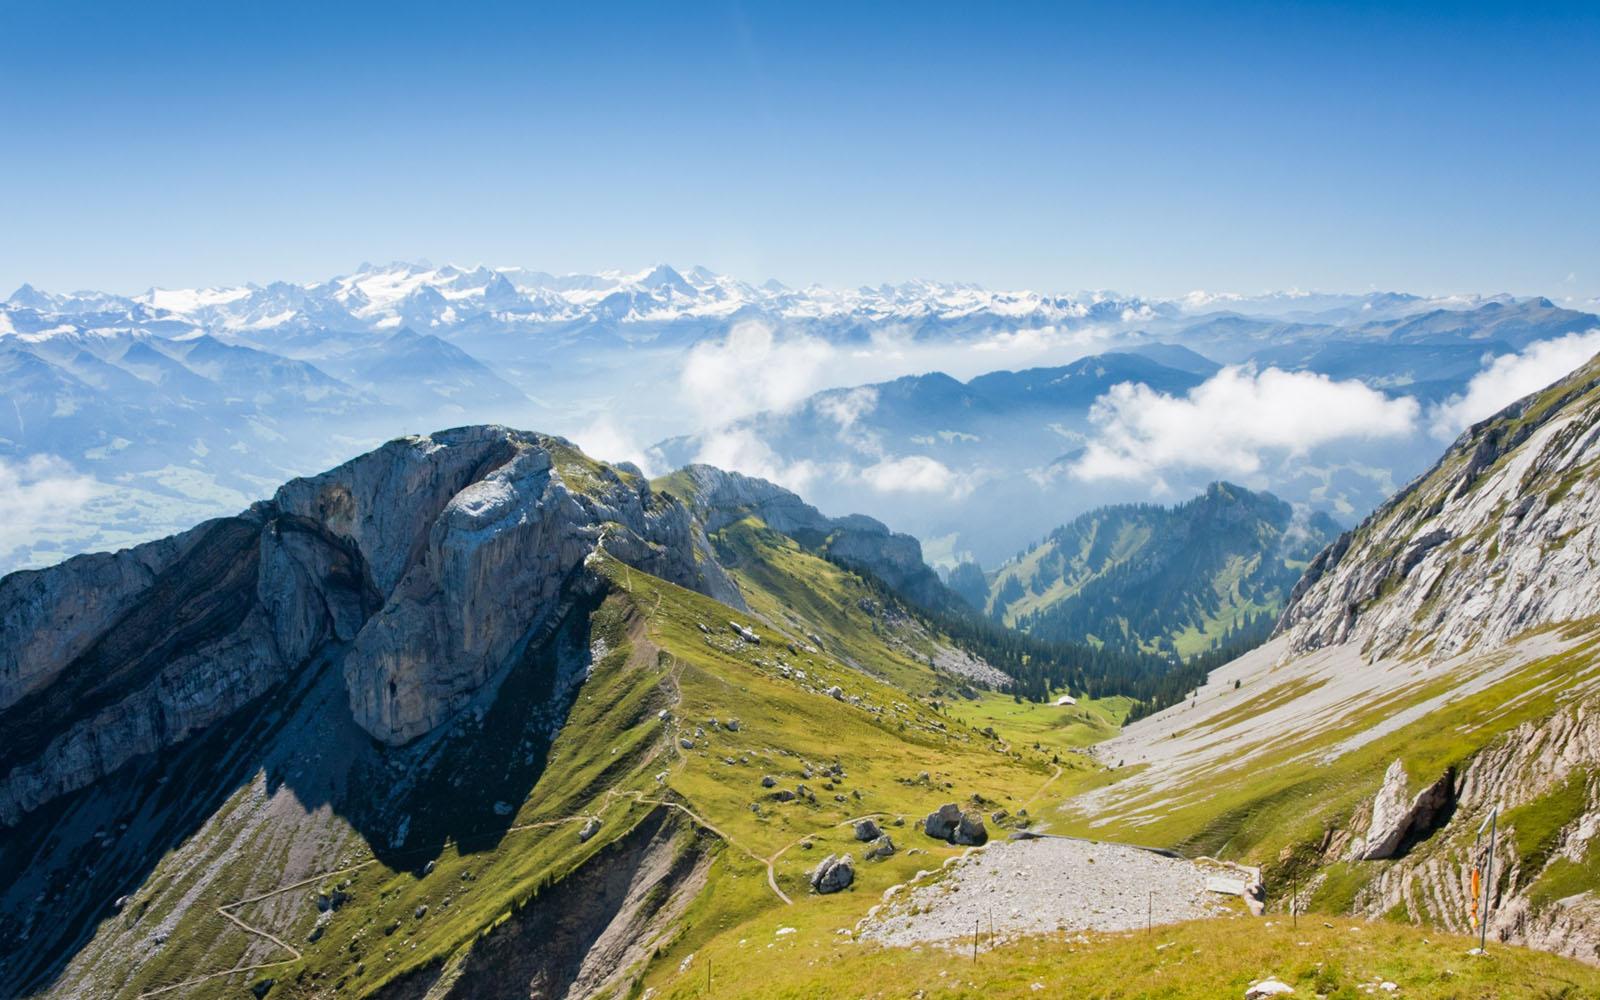 landscape mountain beautiful wallpaper - photo #25